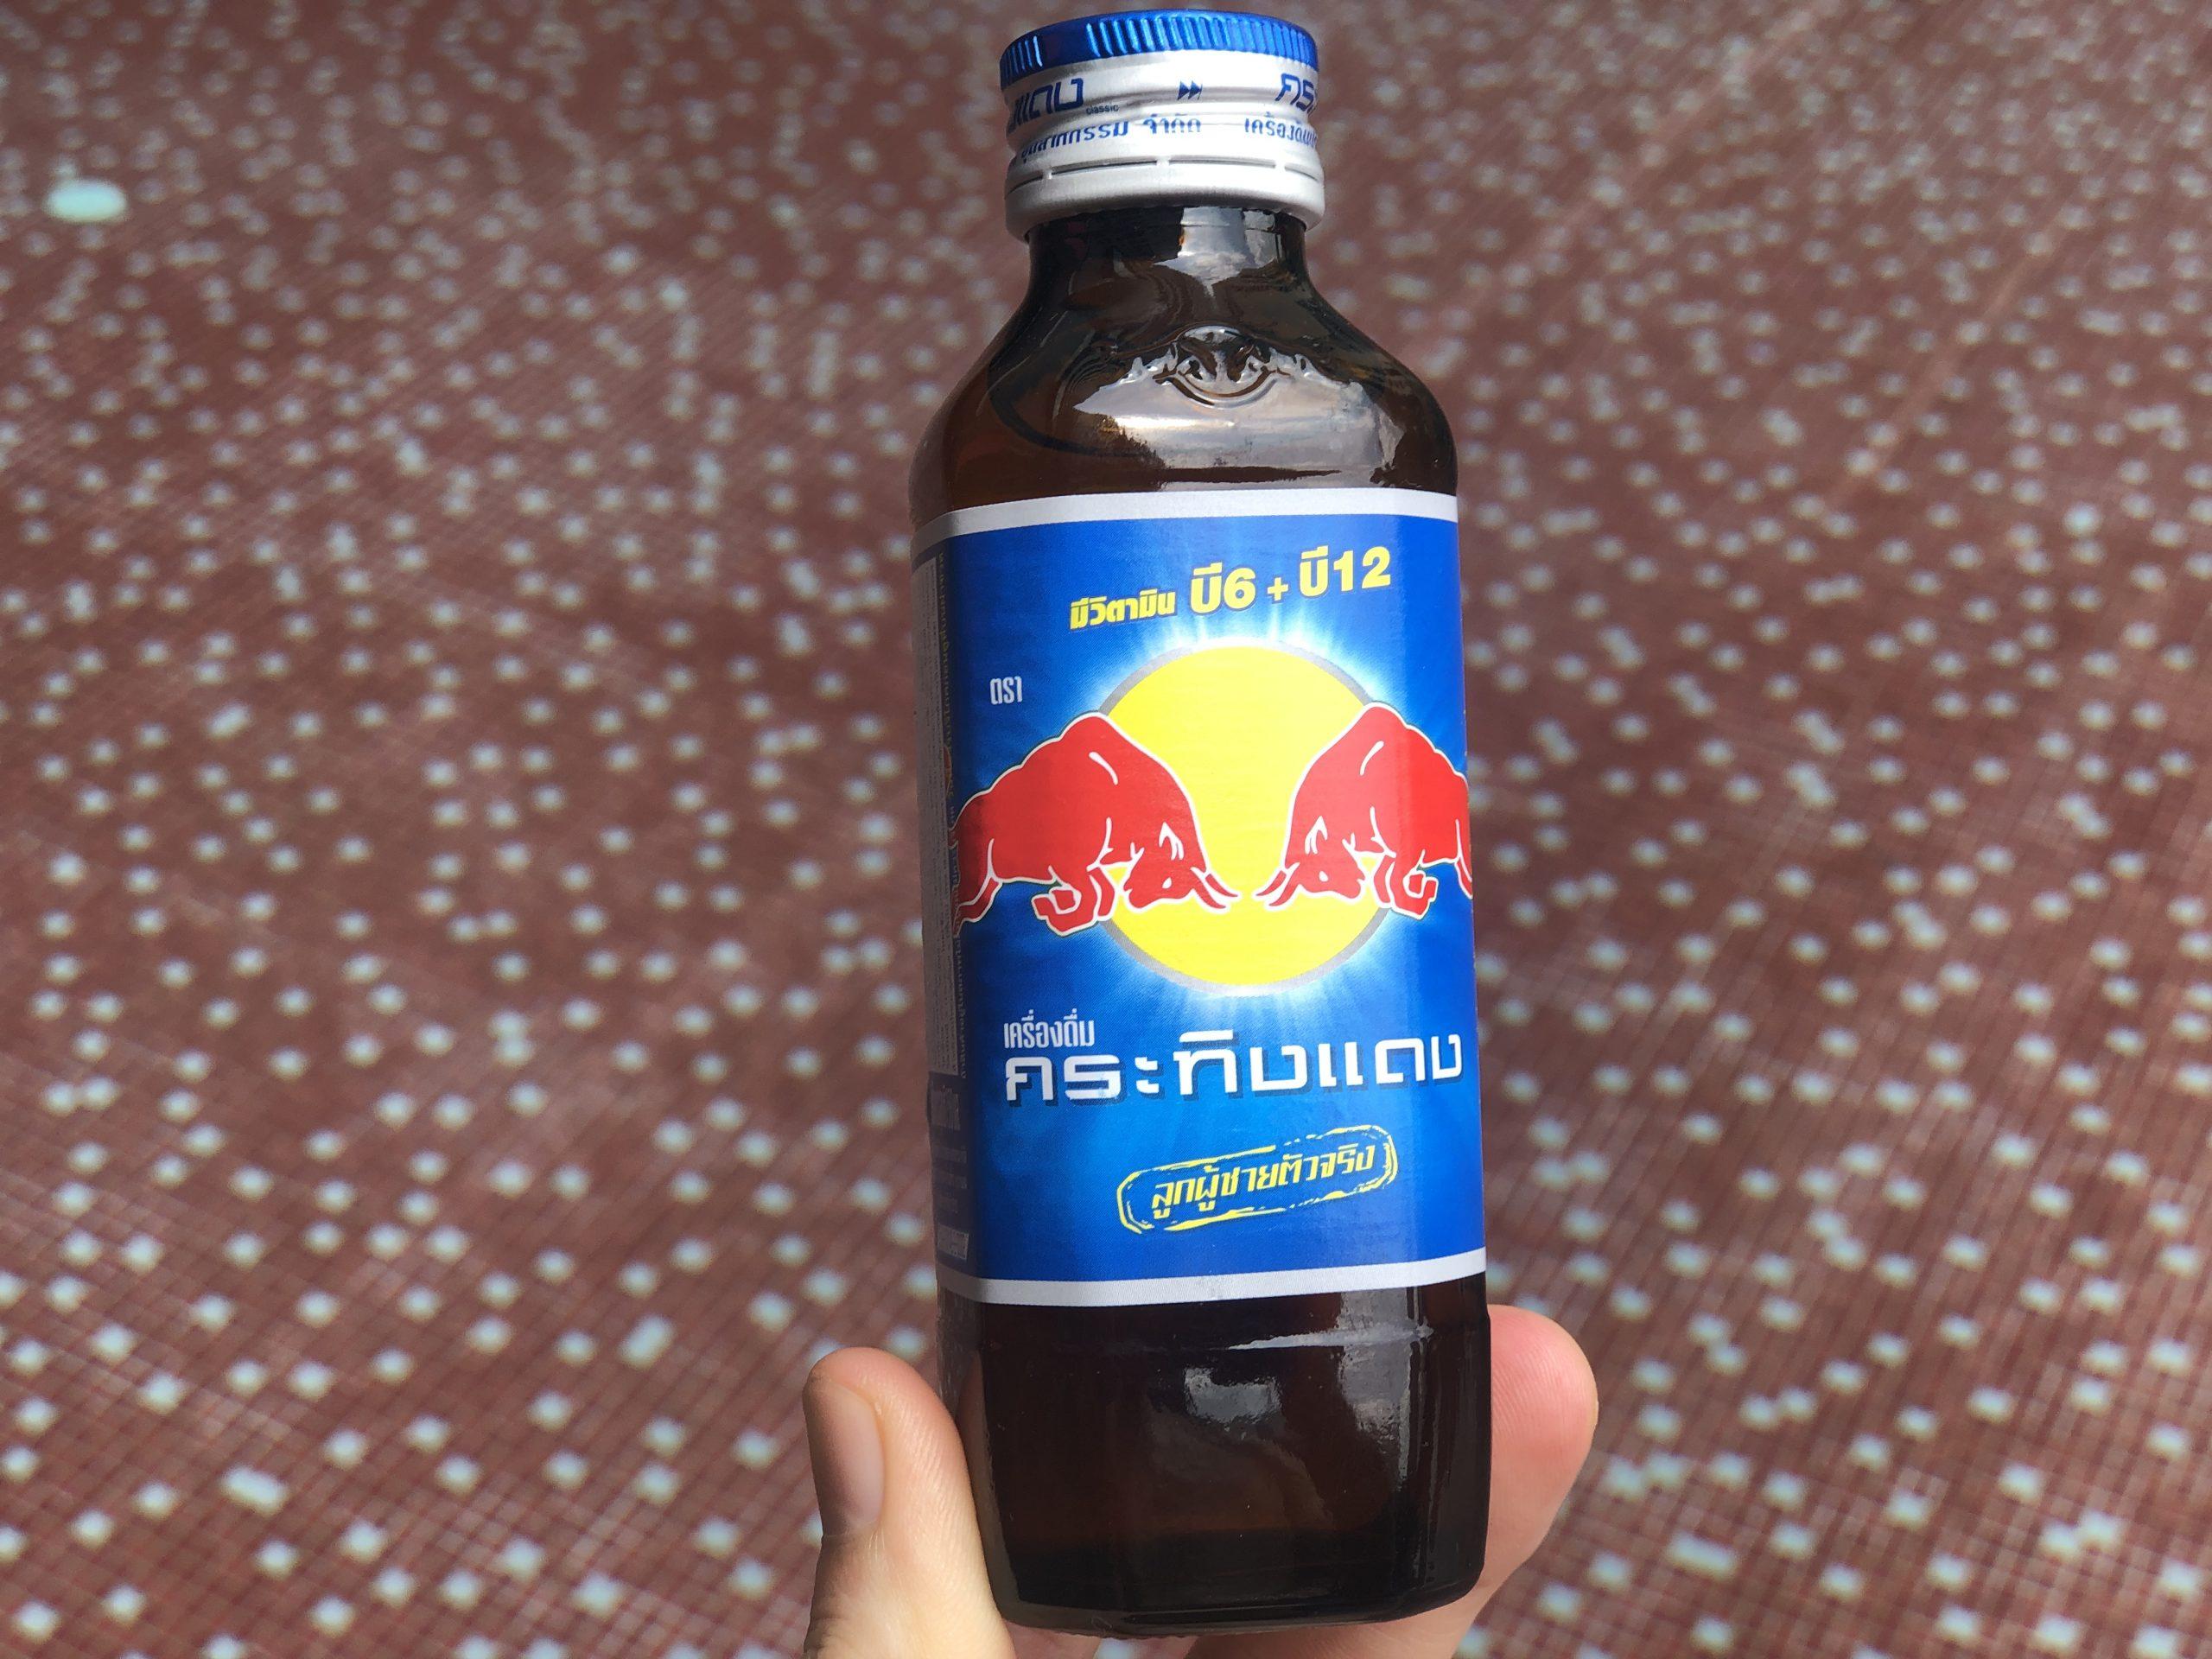 Krating Daeng Energy Drink Caffeine & Ingredients